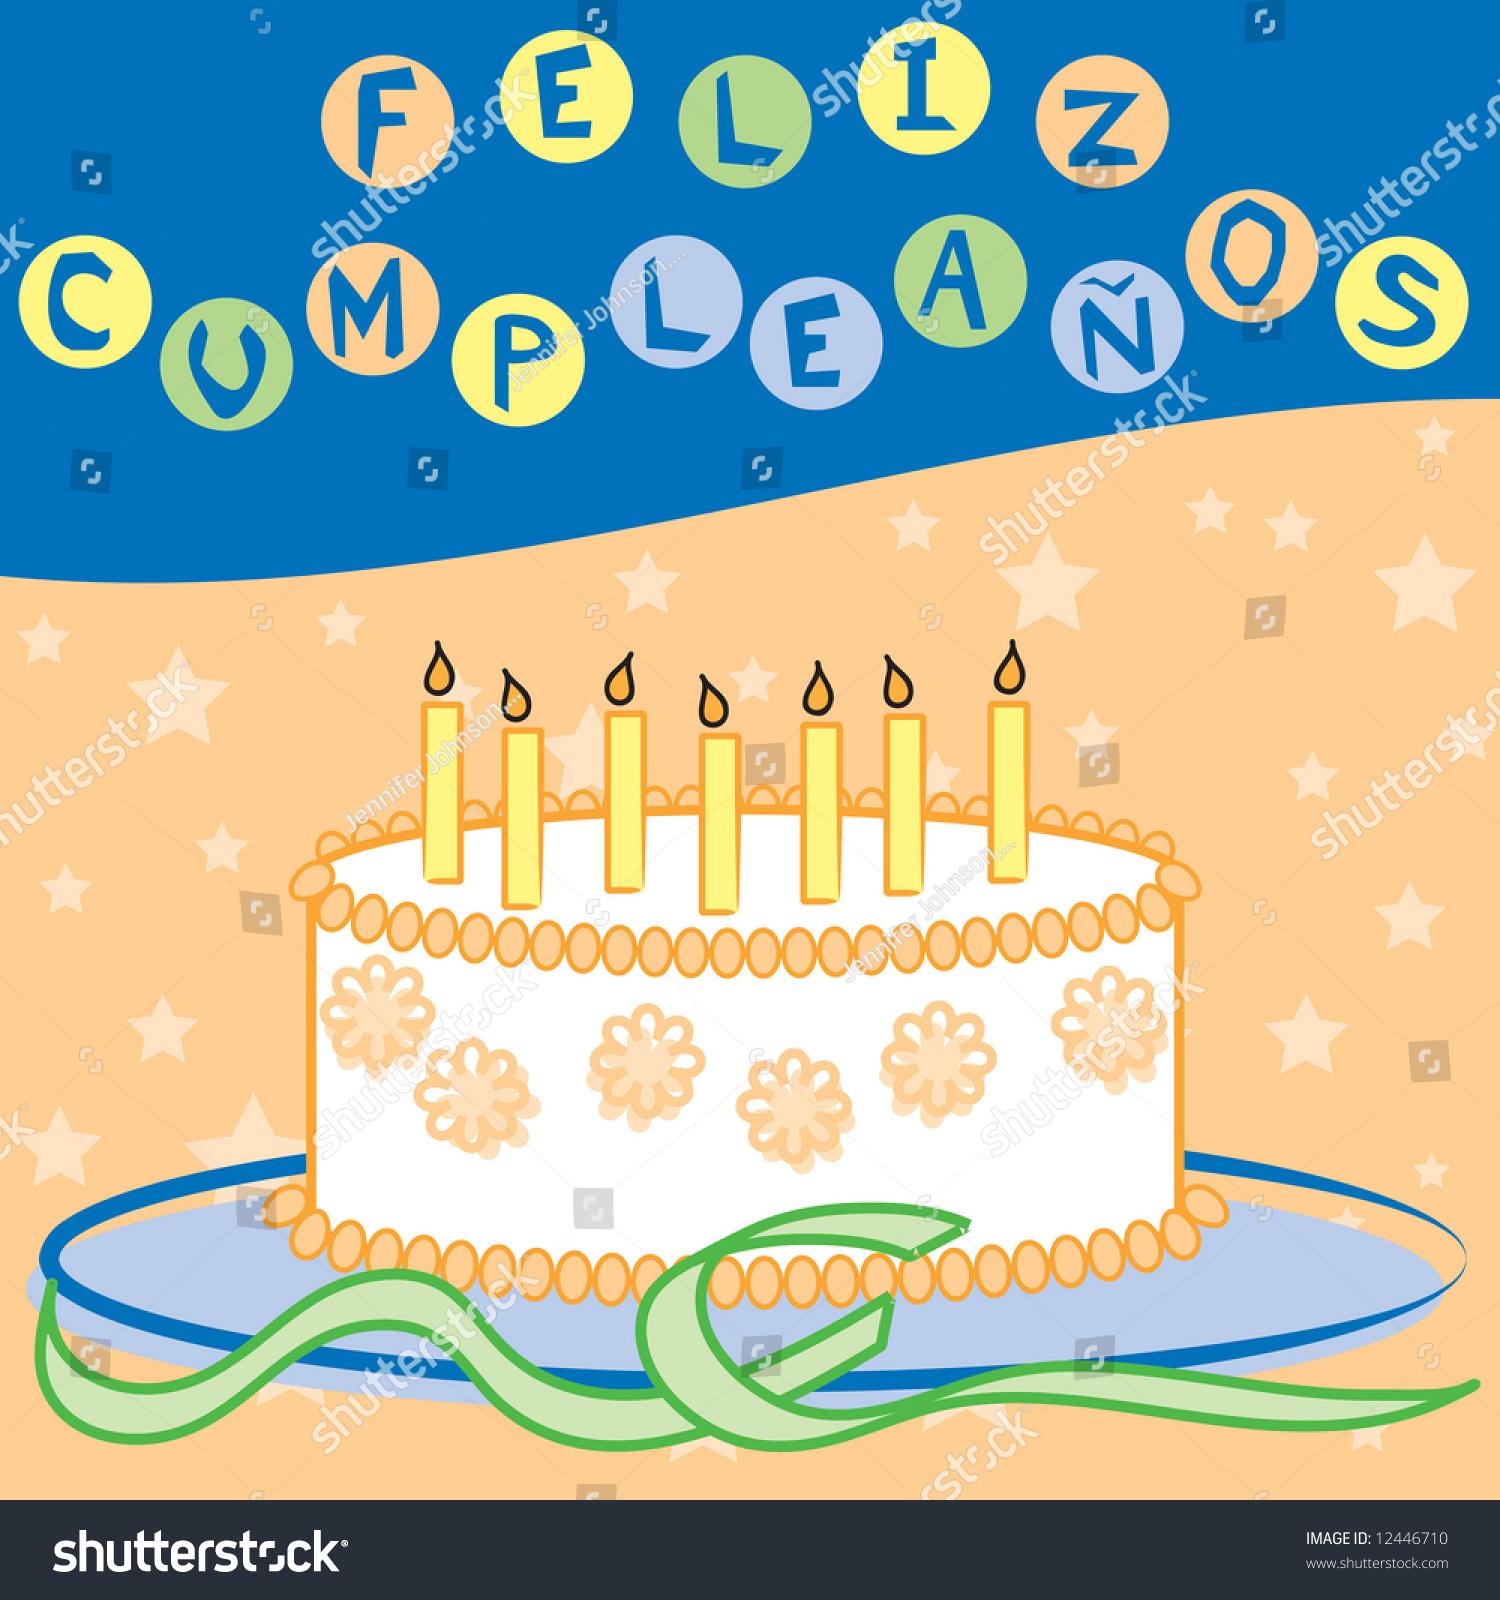 Feliz Cumpleanos Happy Birthday Spanish Stock Illustration